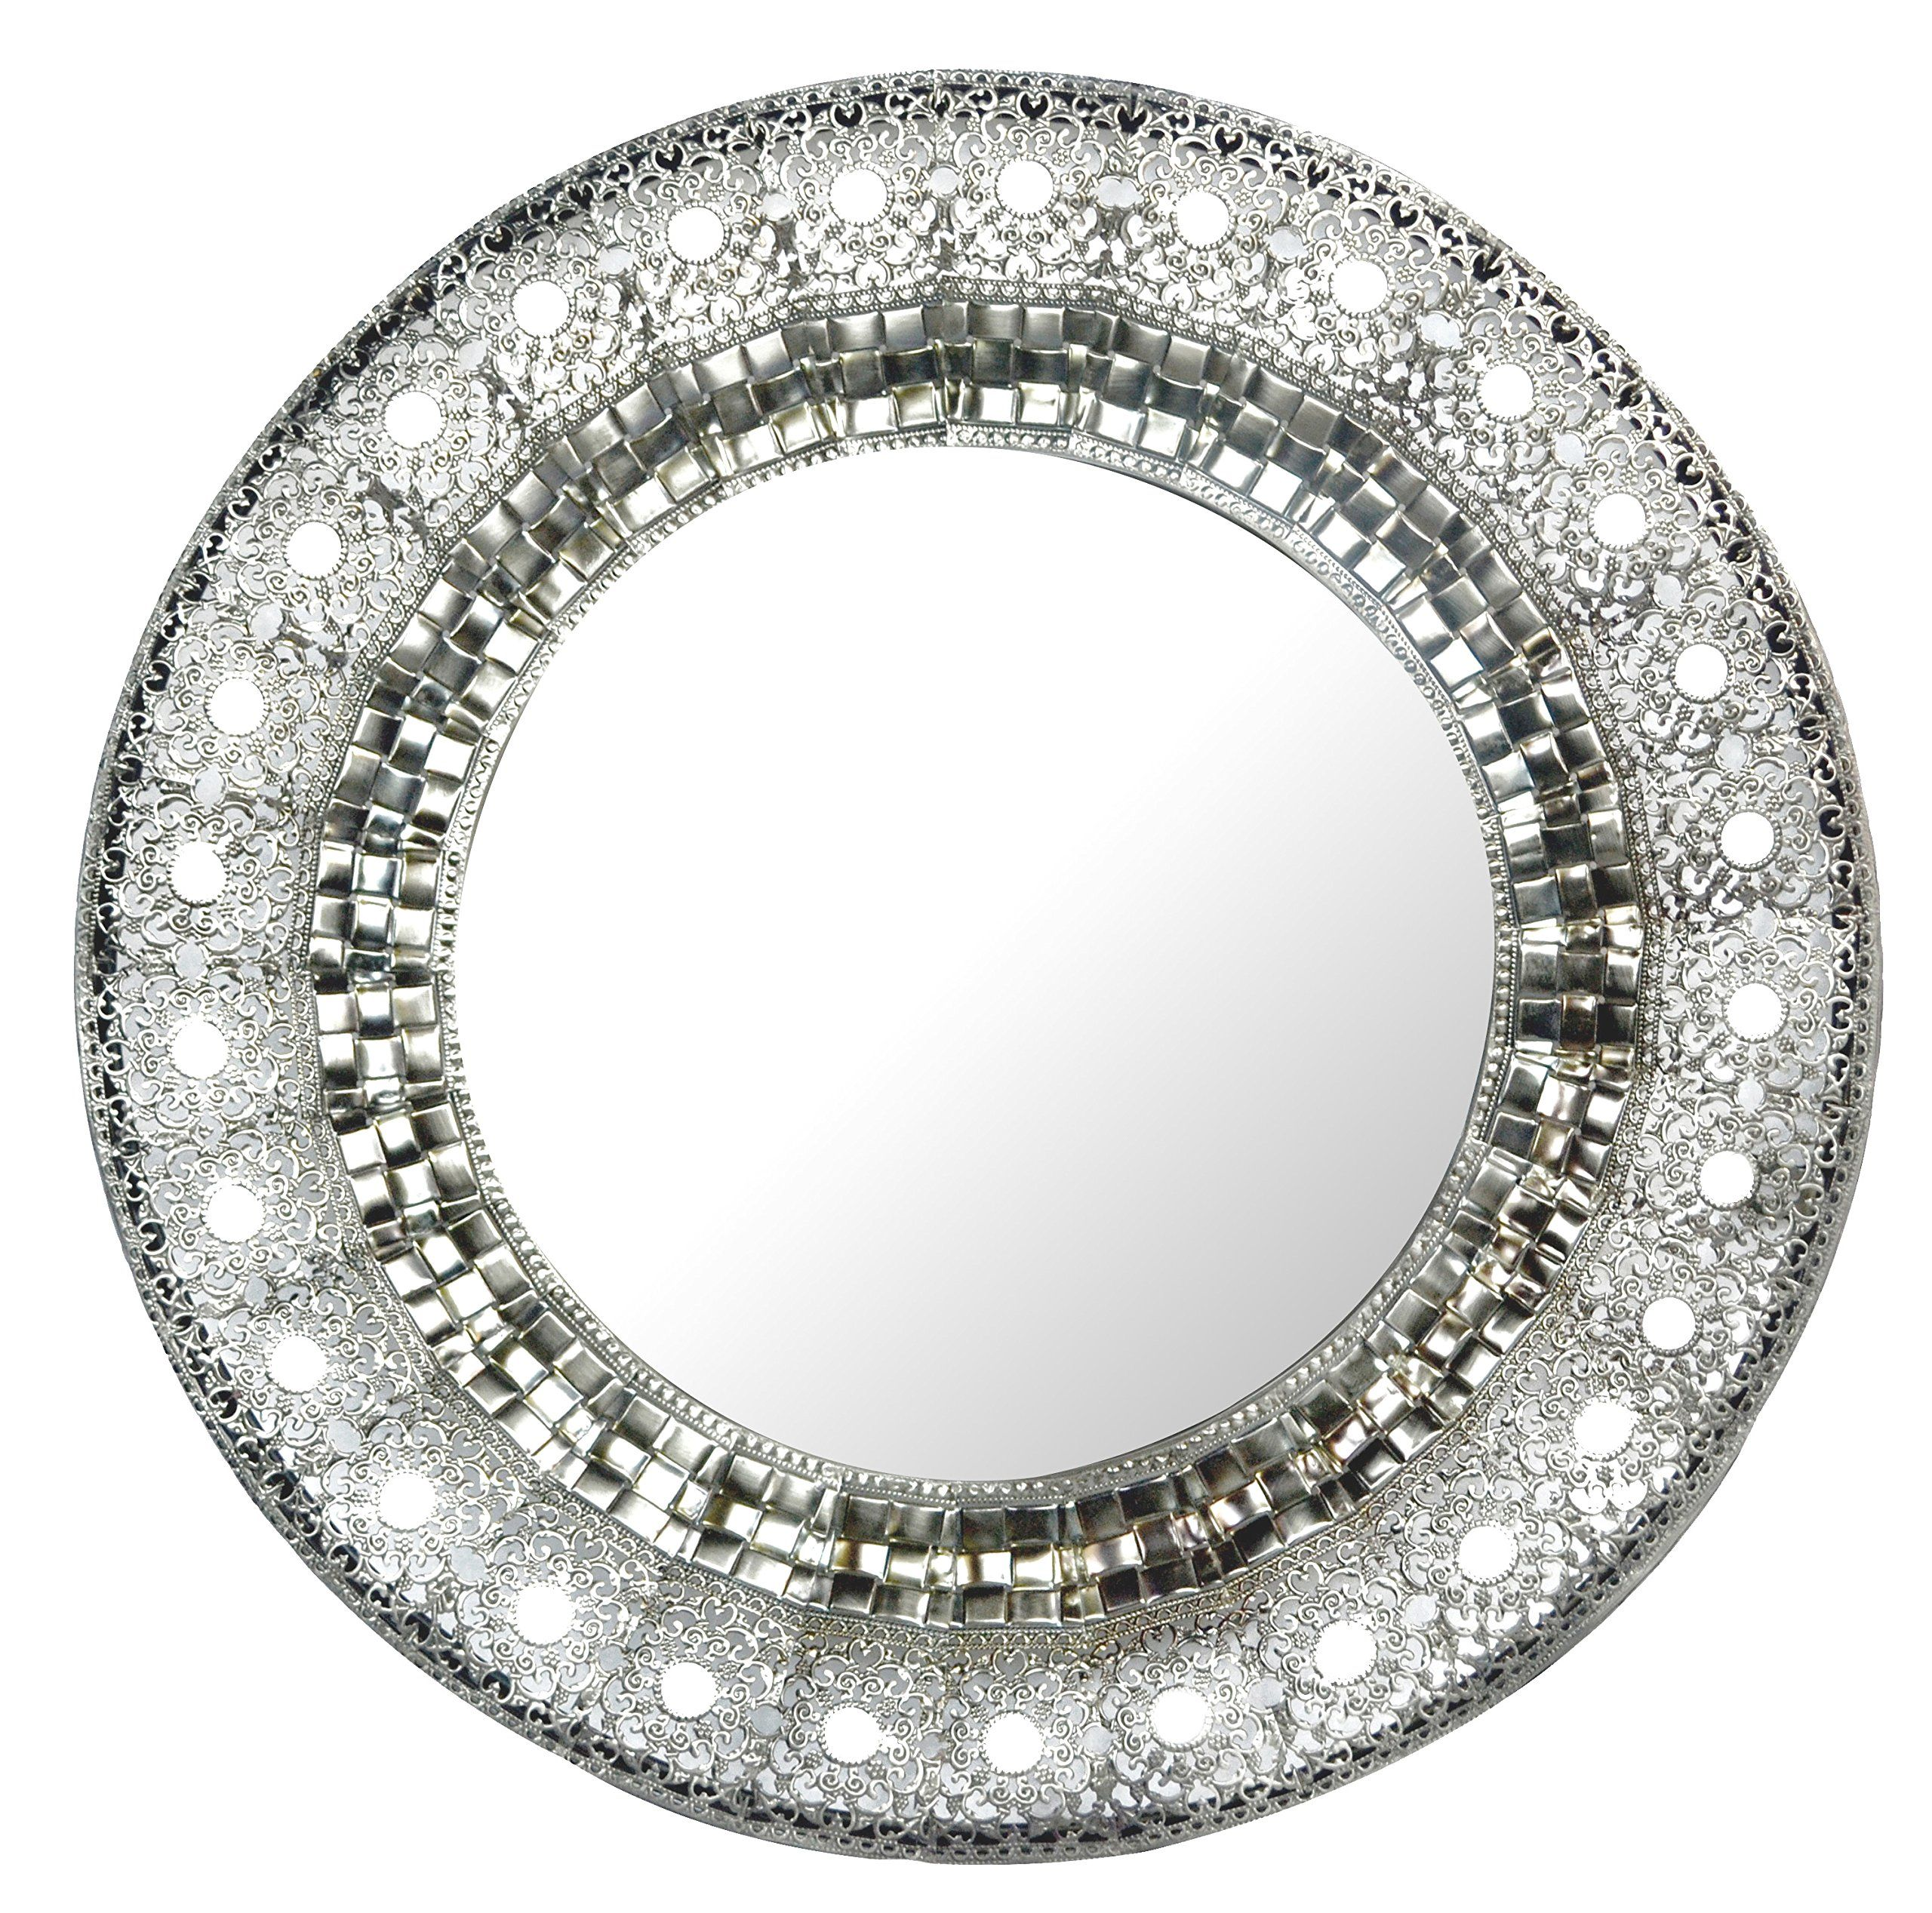 Lulu decor 19 oriental round silver metal wall mirror for Round silver wall mirror